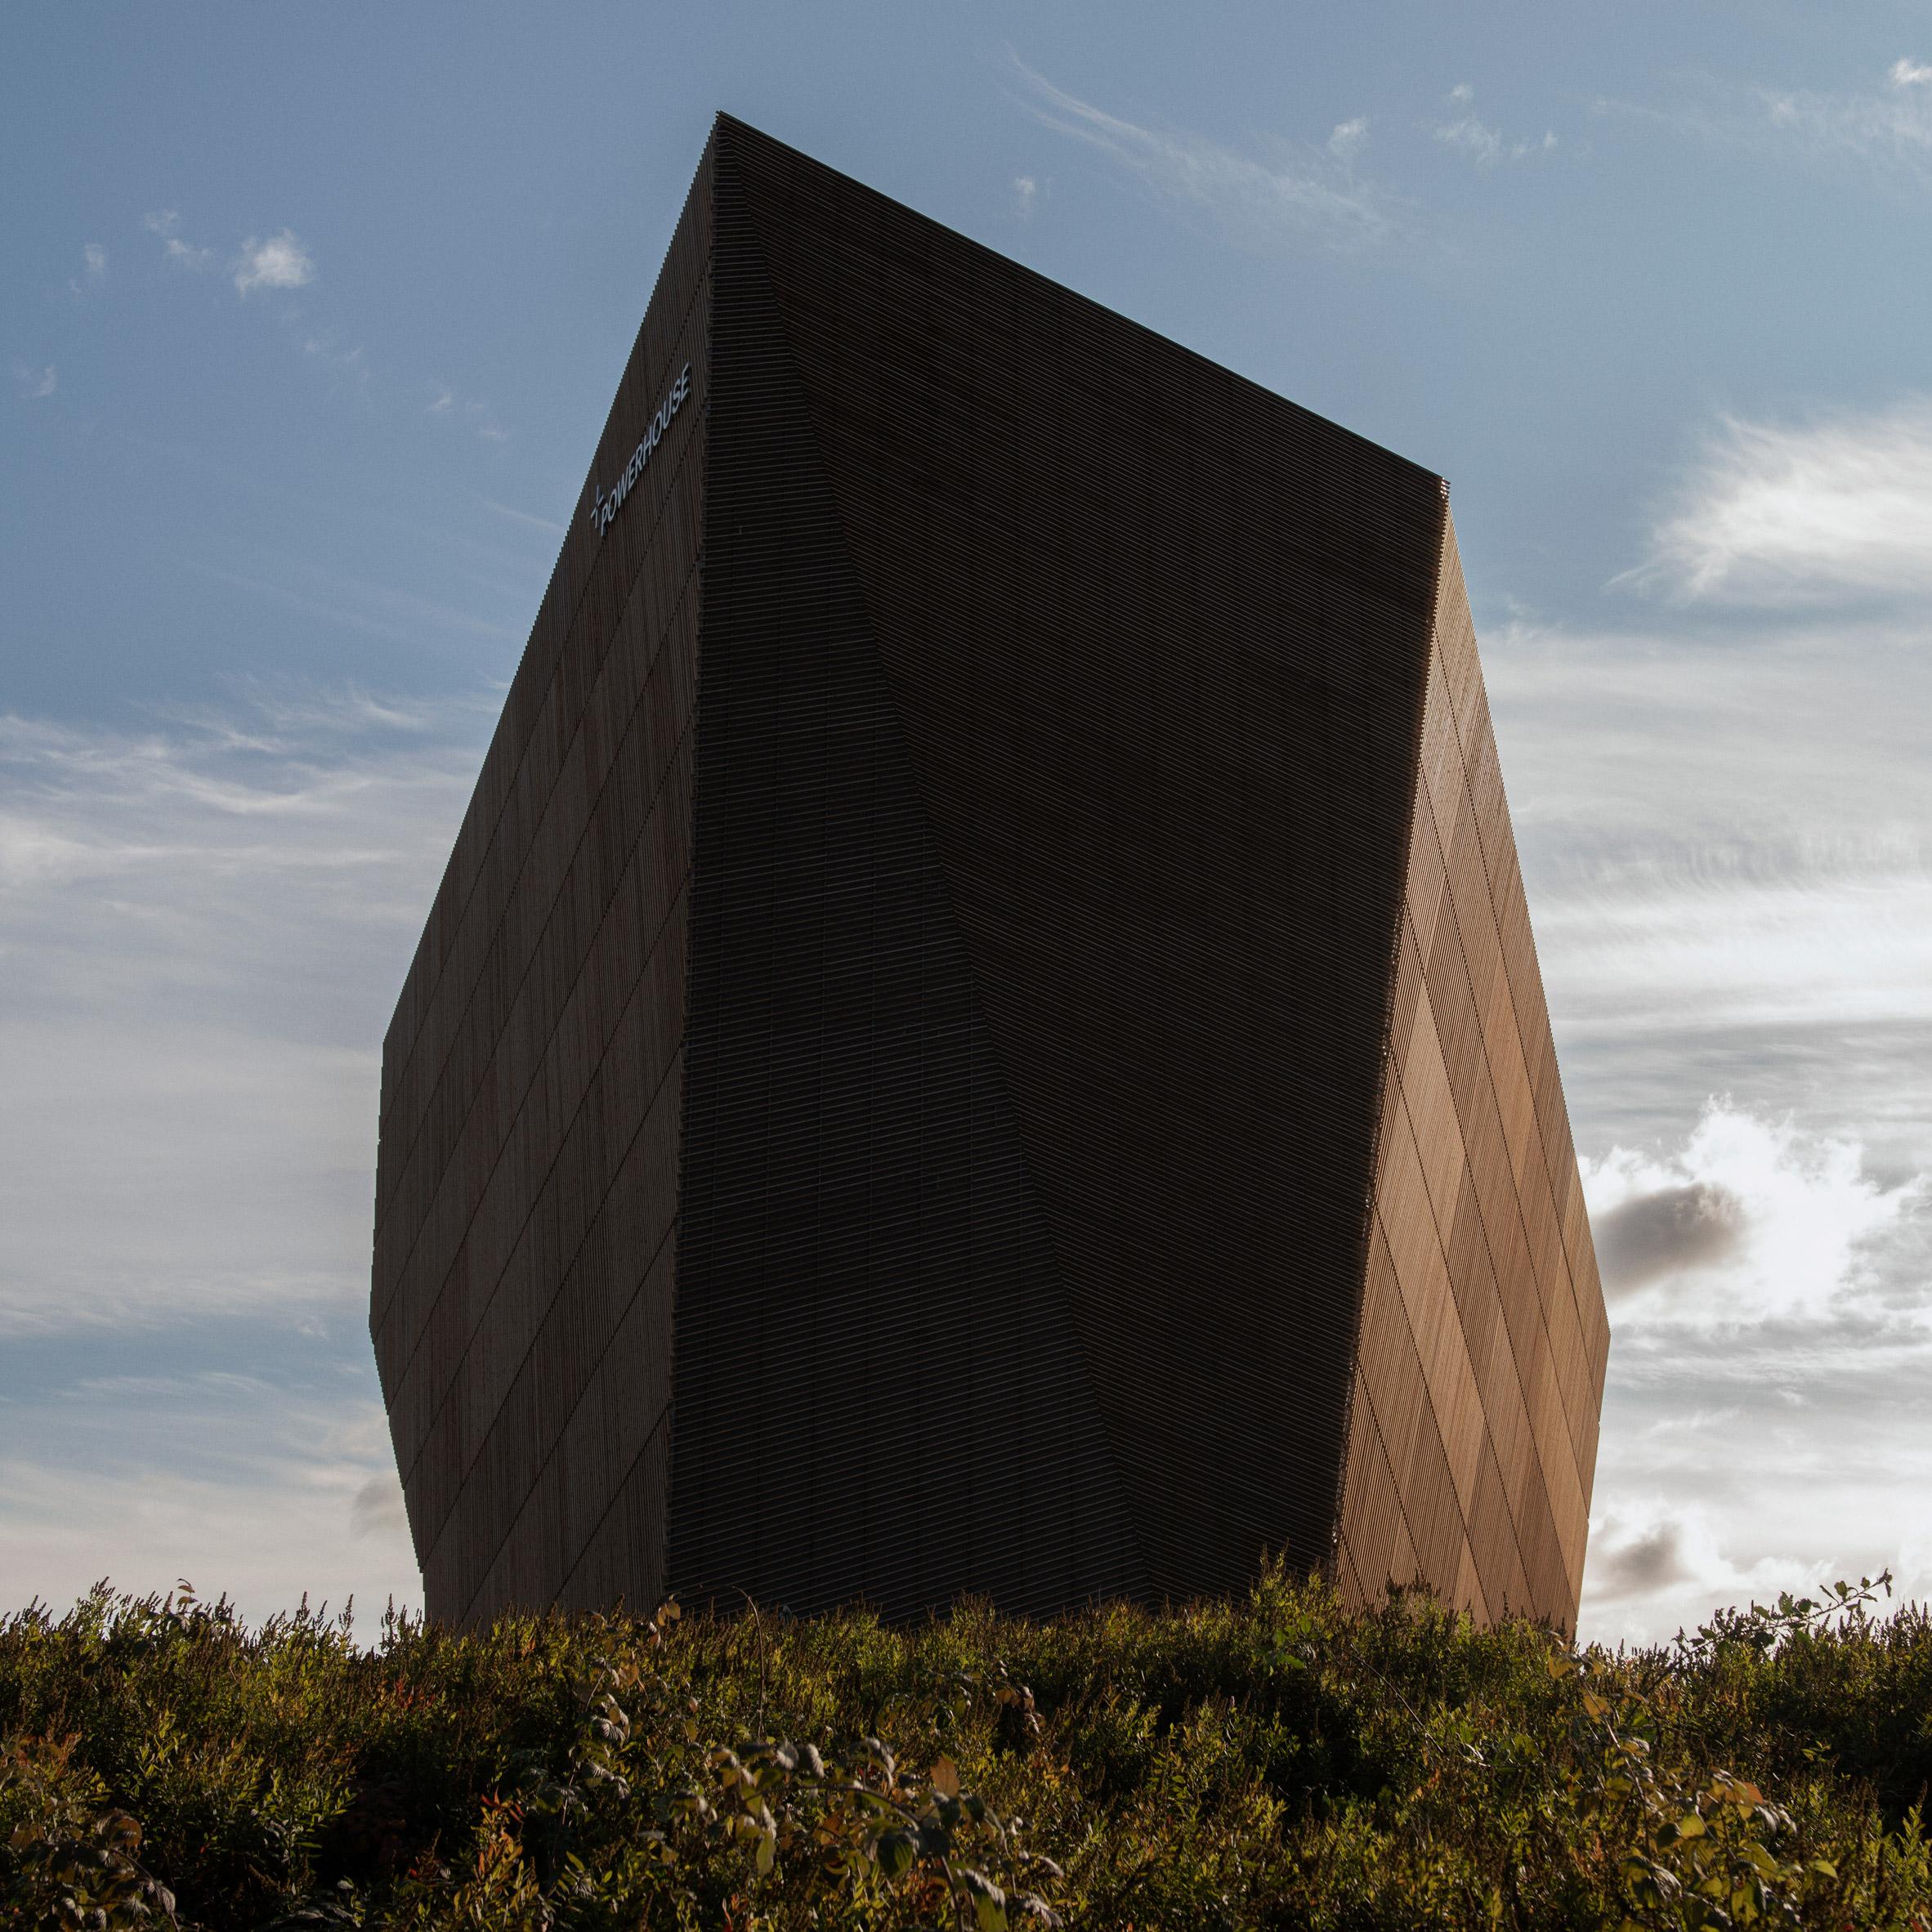 The angular Powerhouse Telemark office